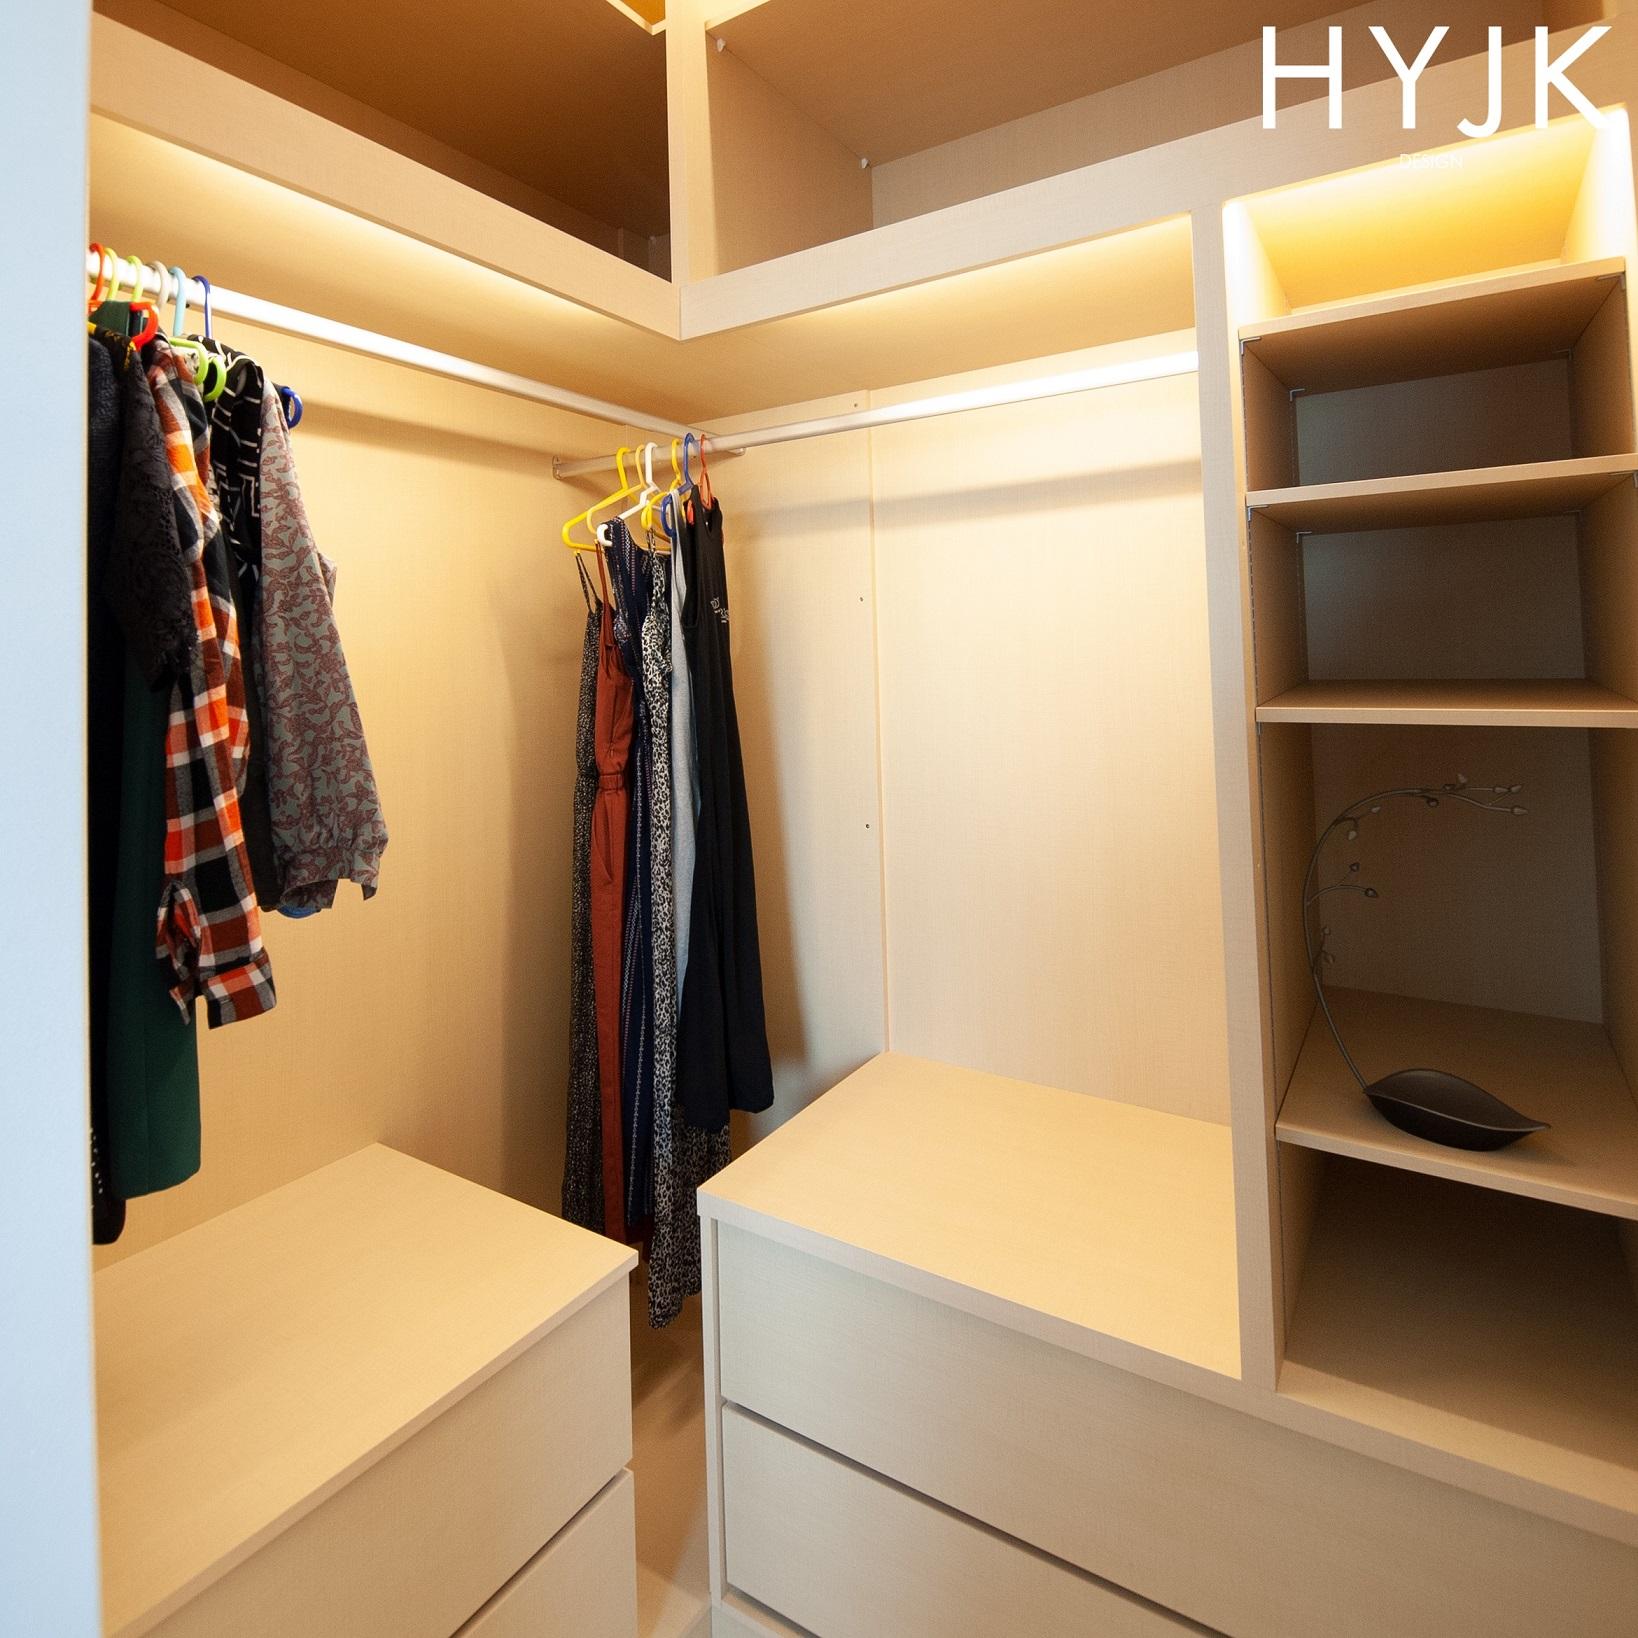 Maximizing wardrobe space in a small area.